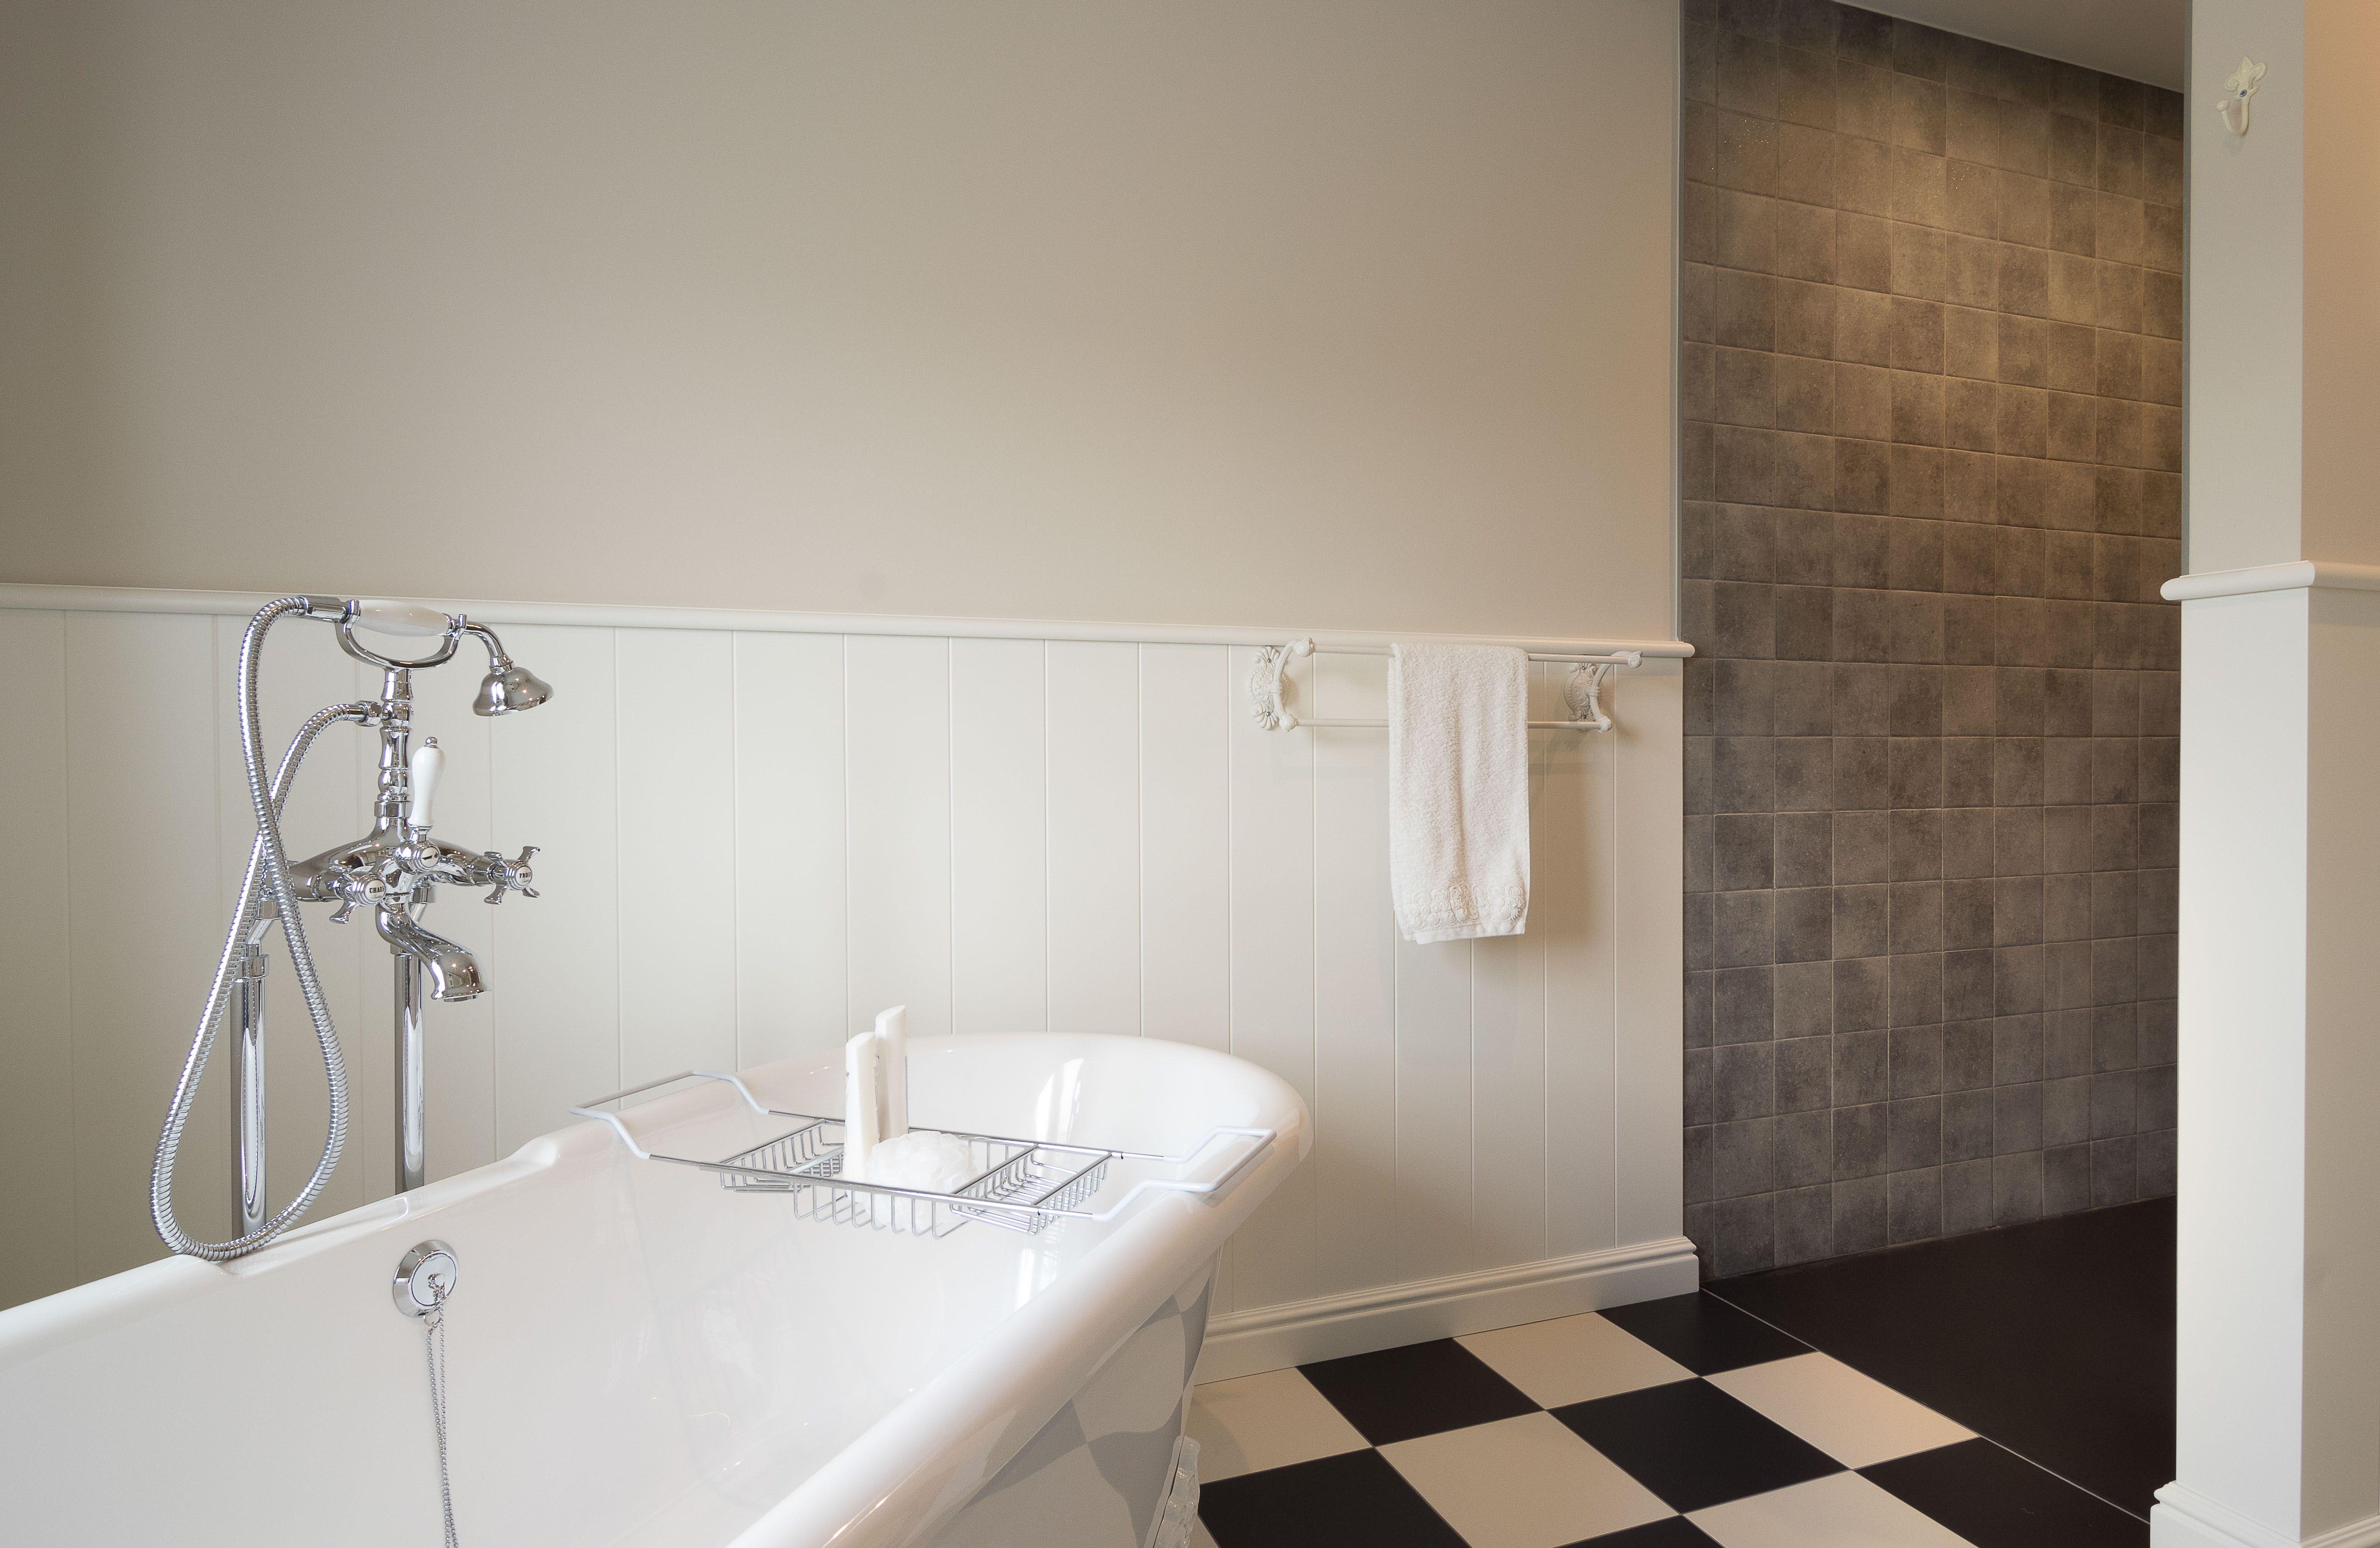 Houten lambrisering rondom in de badkamer vloer in dambord